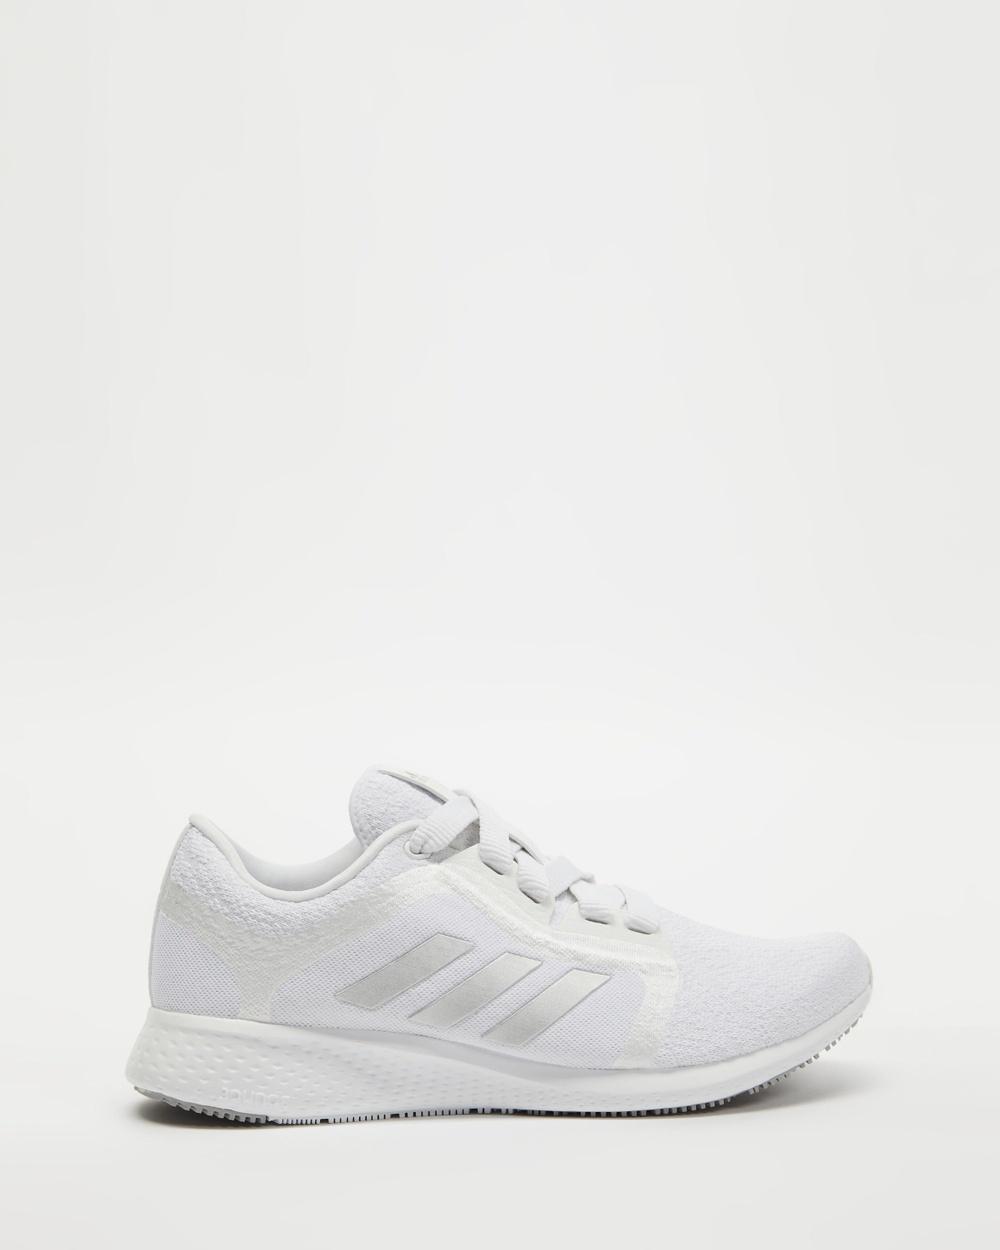 adidas Performance Edge Lux 4 Women's Running Shoes Cloud White, Metallic Silver & Grey Two Australia